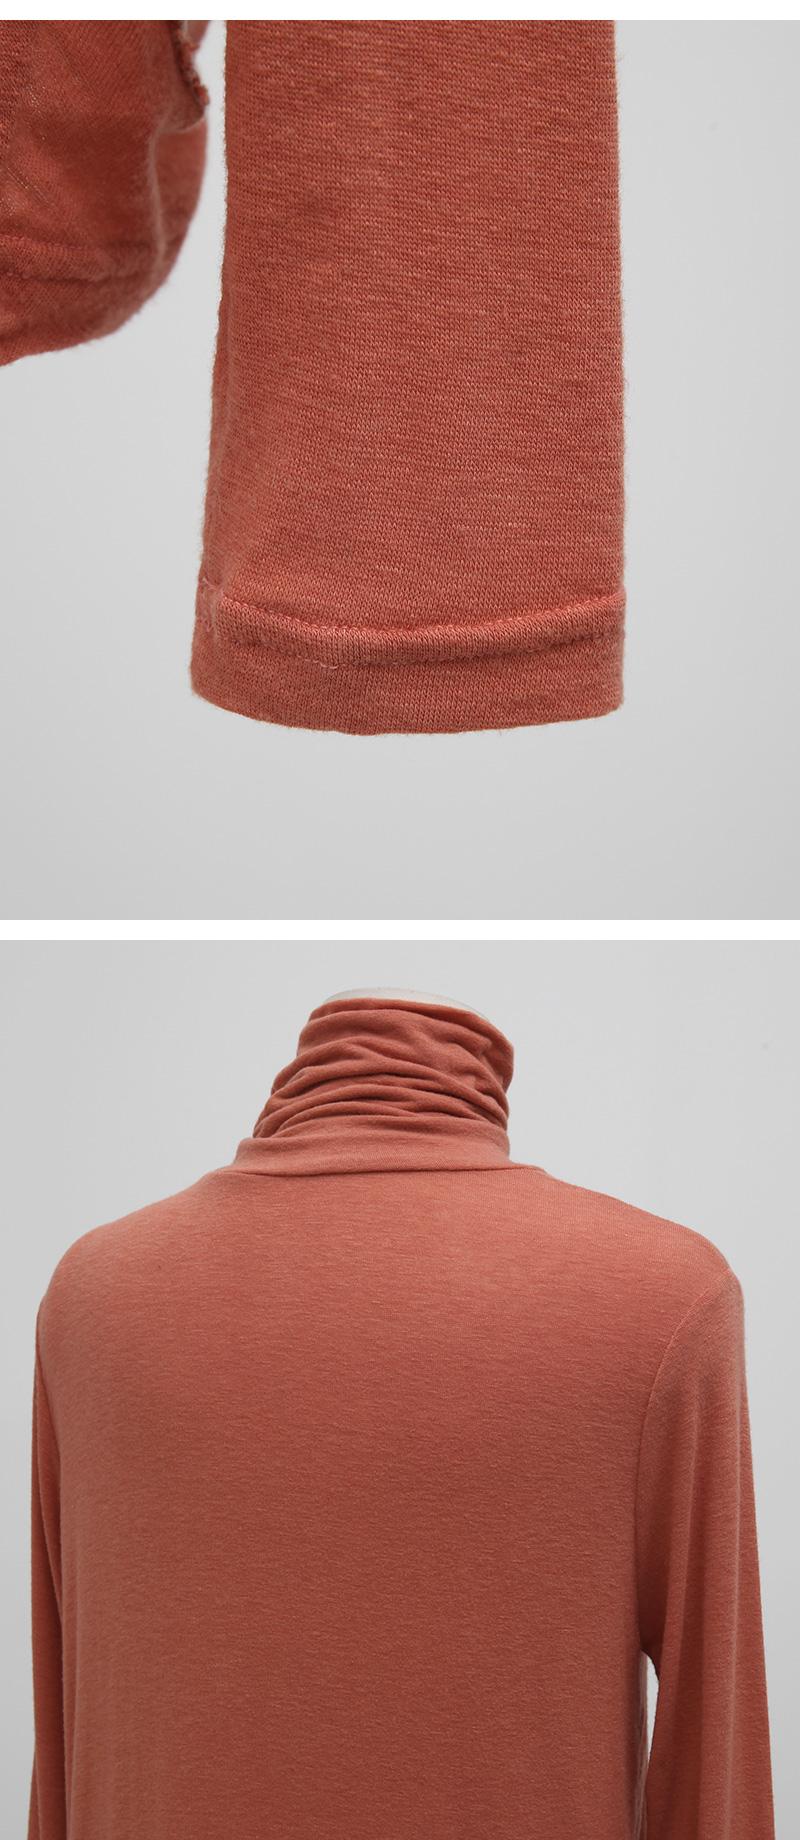 Than slim wool pola T (size : free)